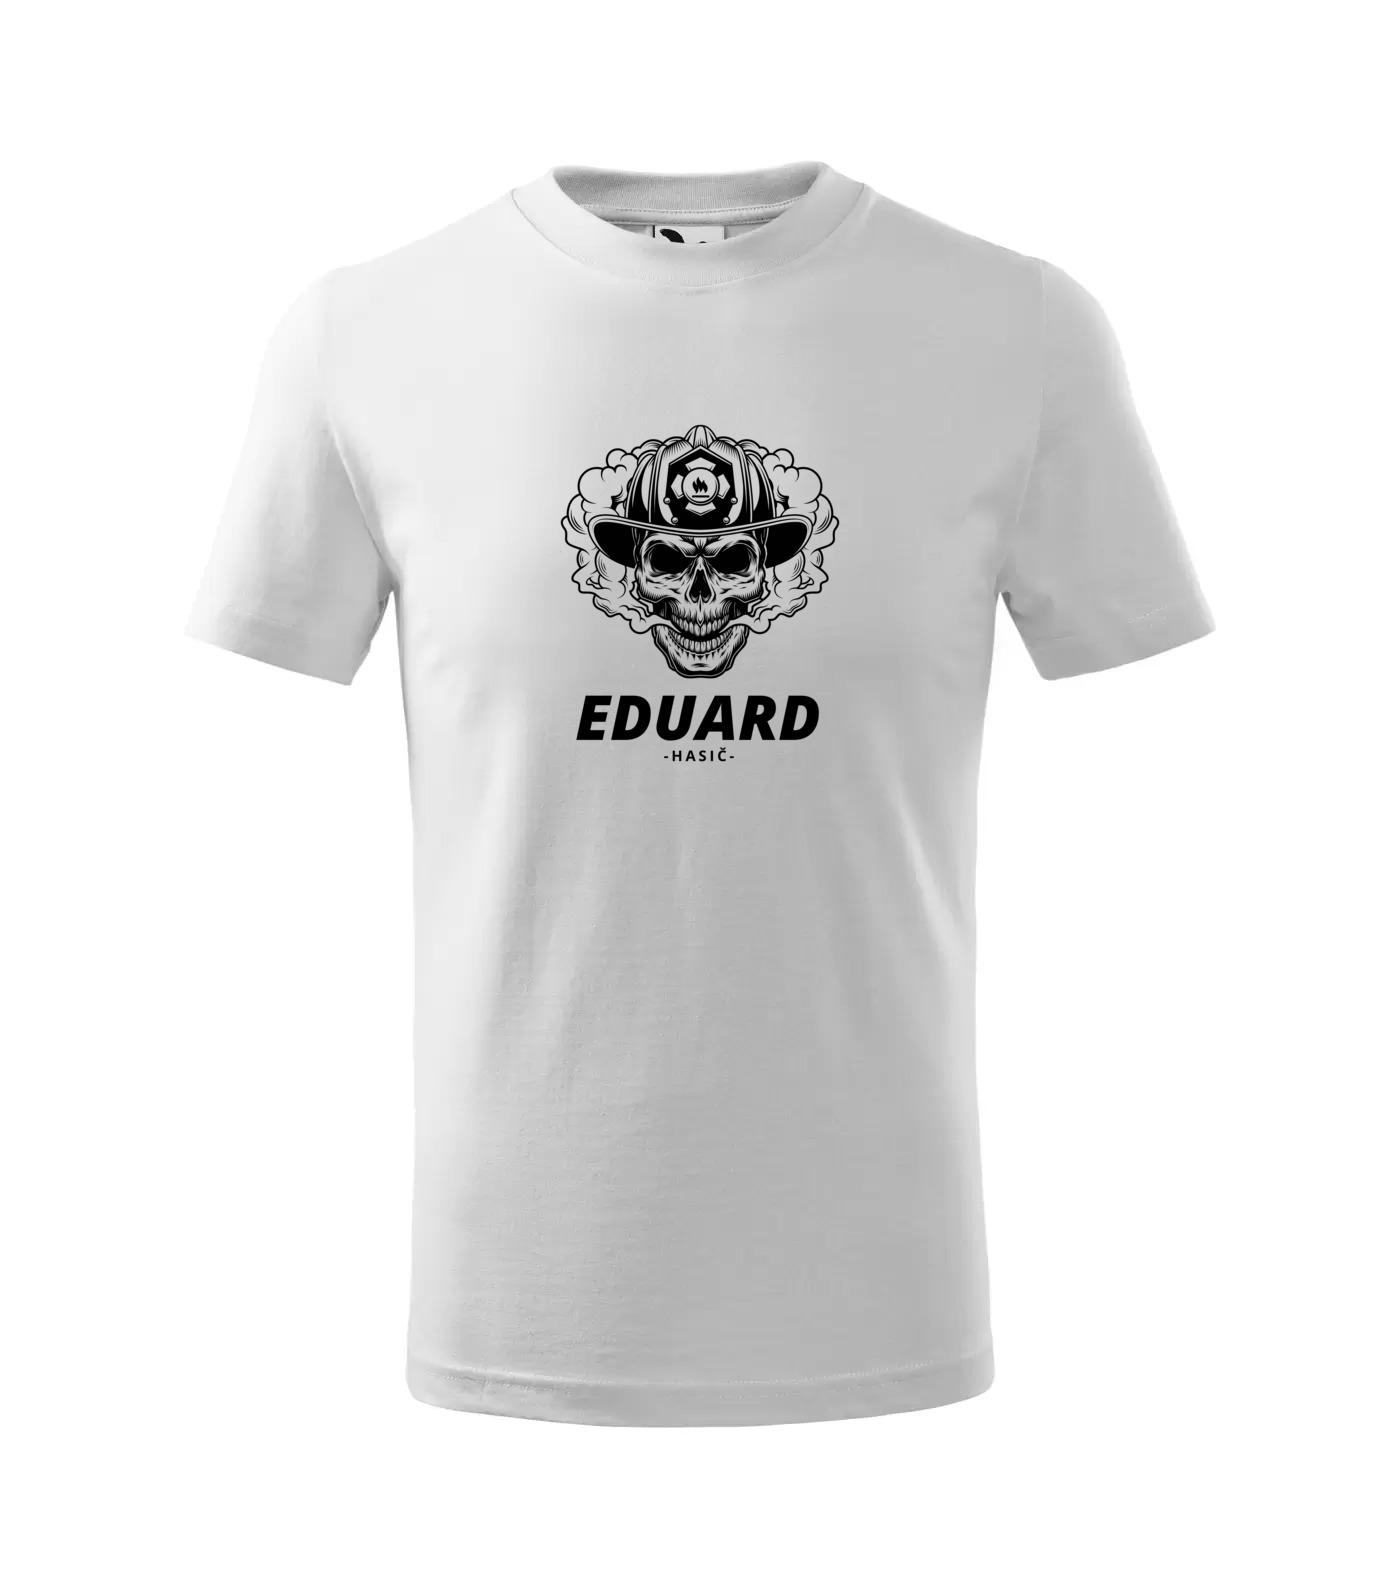 Tričko Hasič Eduard